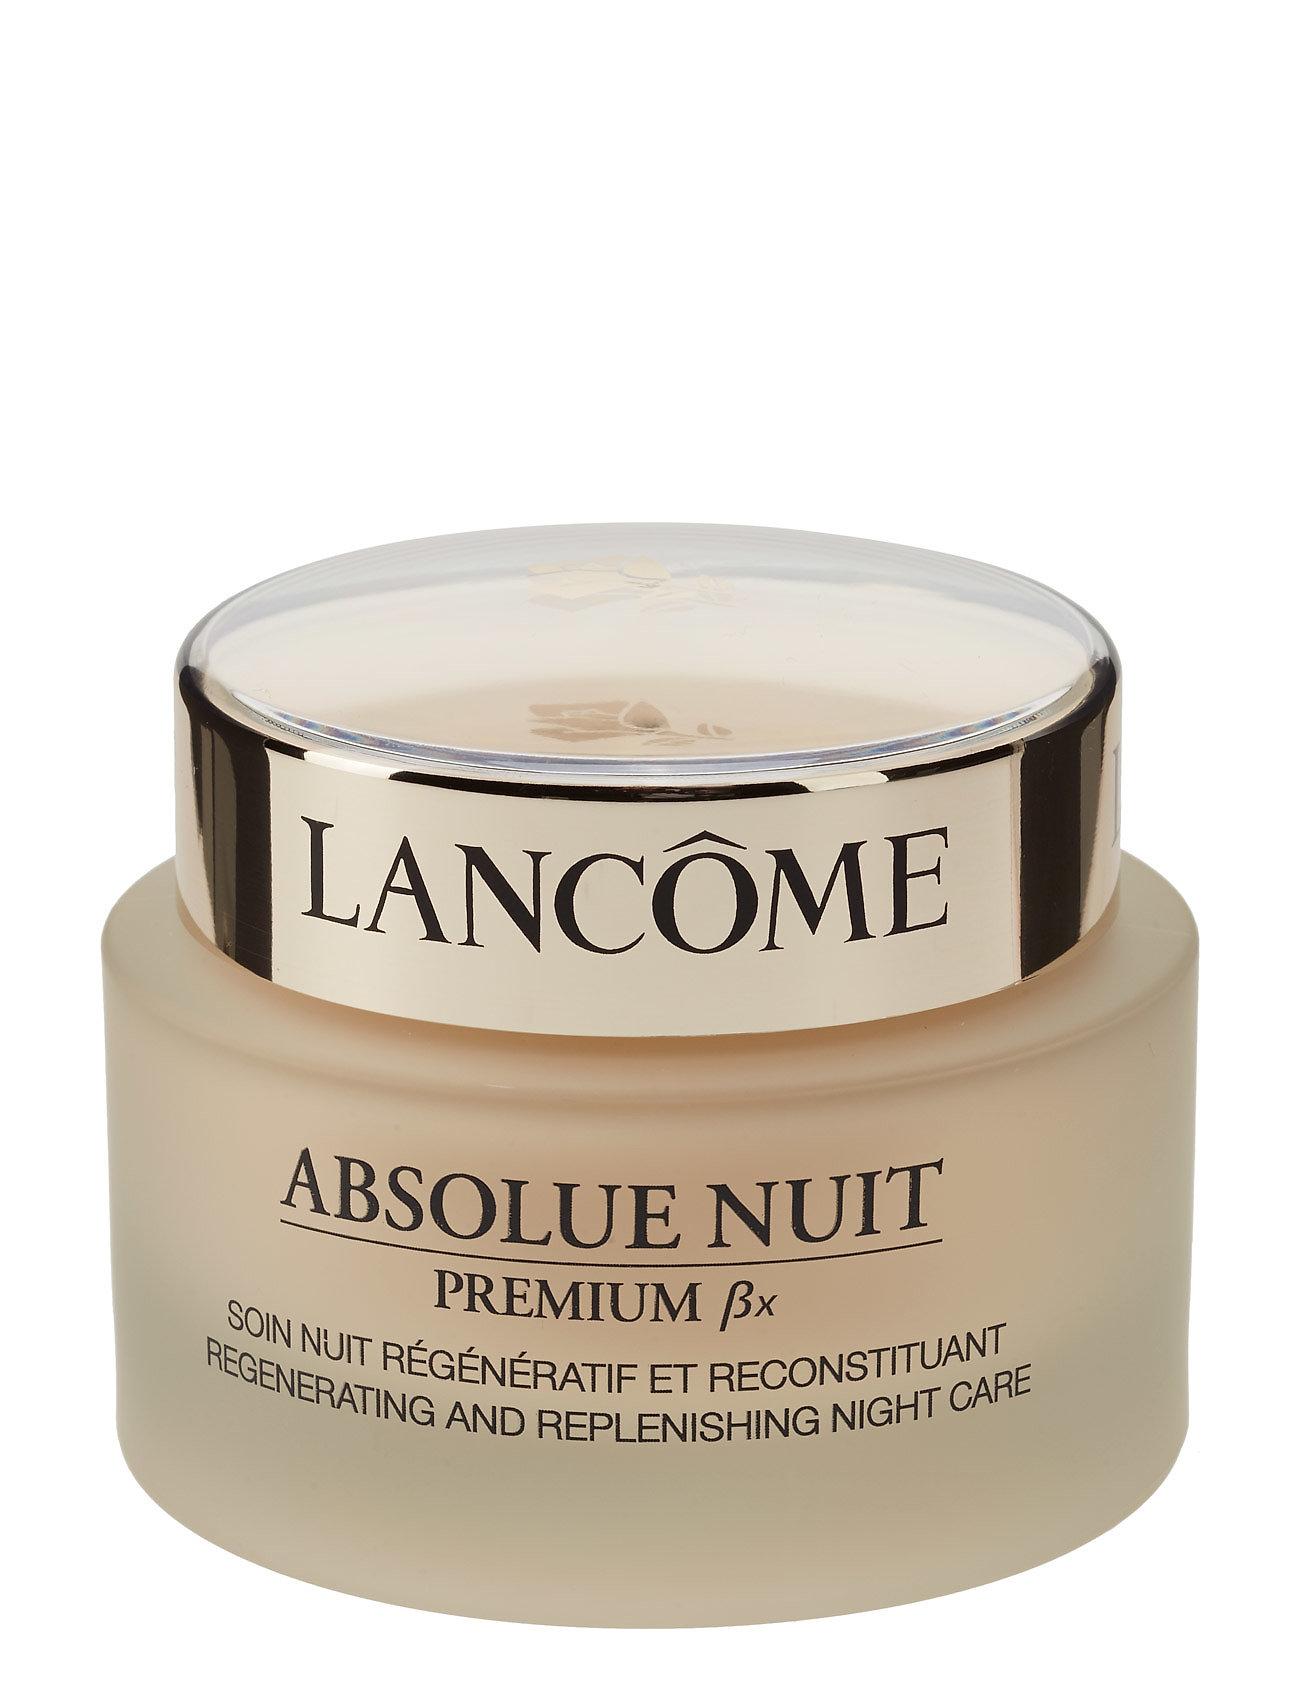 lancã´me – Absolue premium night cream 50 ml på boozt.com dk